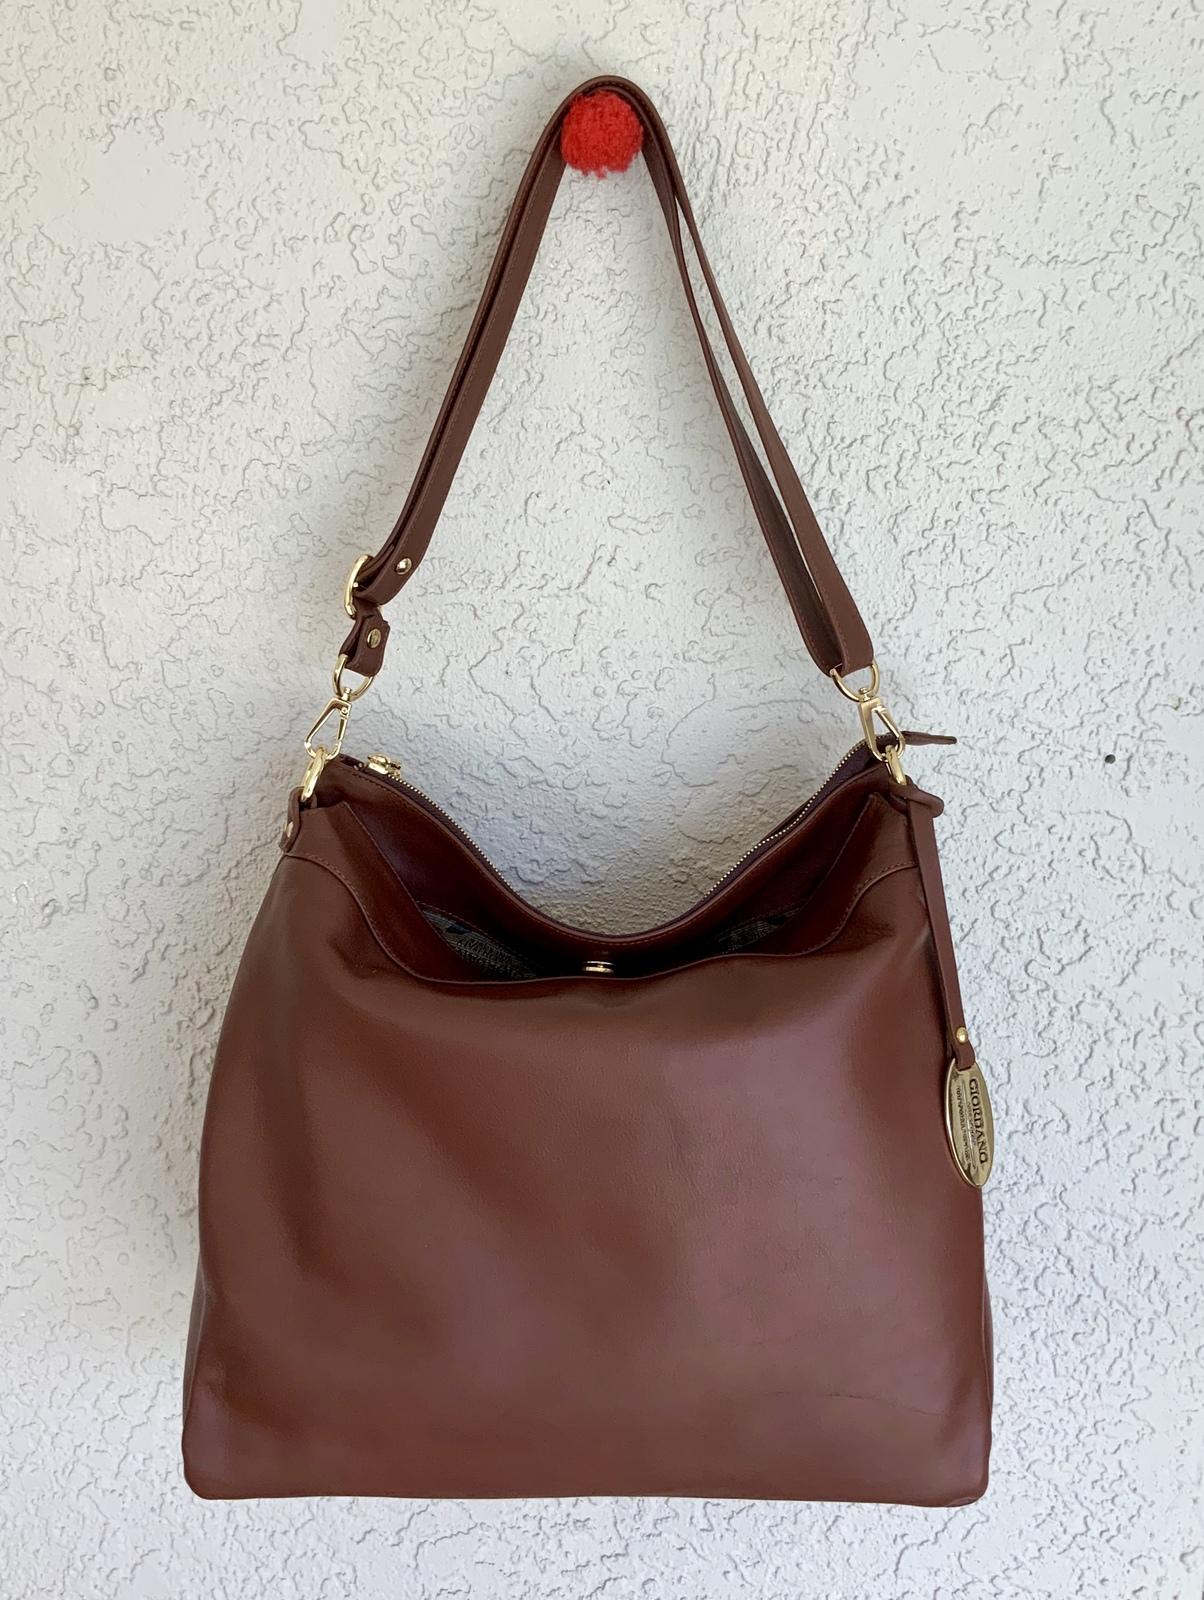 30c21cc42cc2 New Giordano Made in Italy Brown Italian Leather Hobo Handbag Shoulder Bag